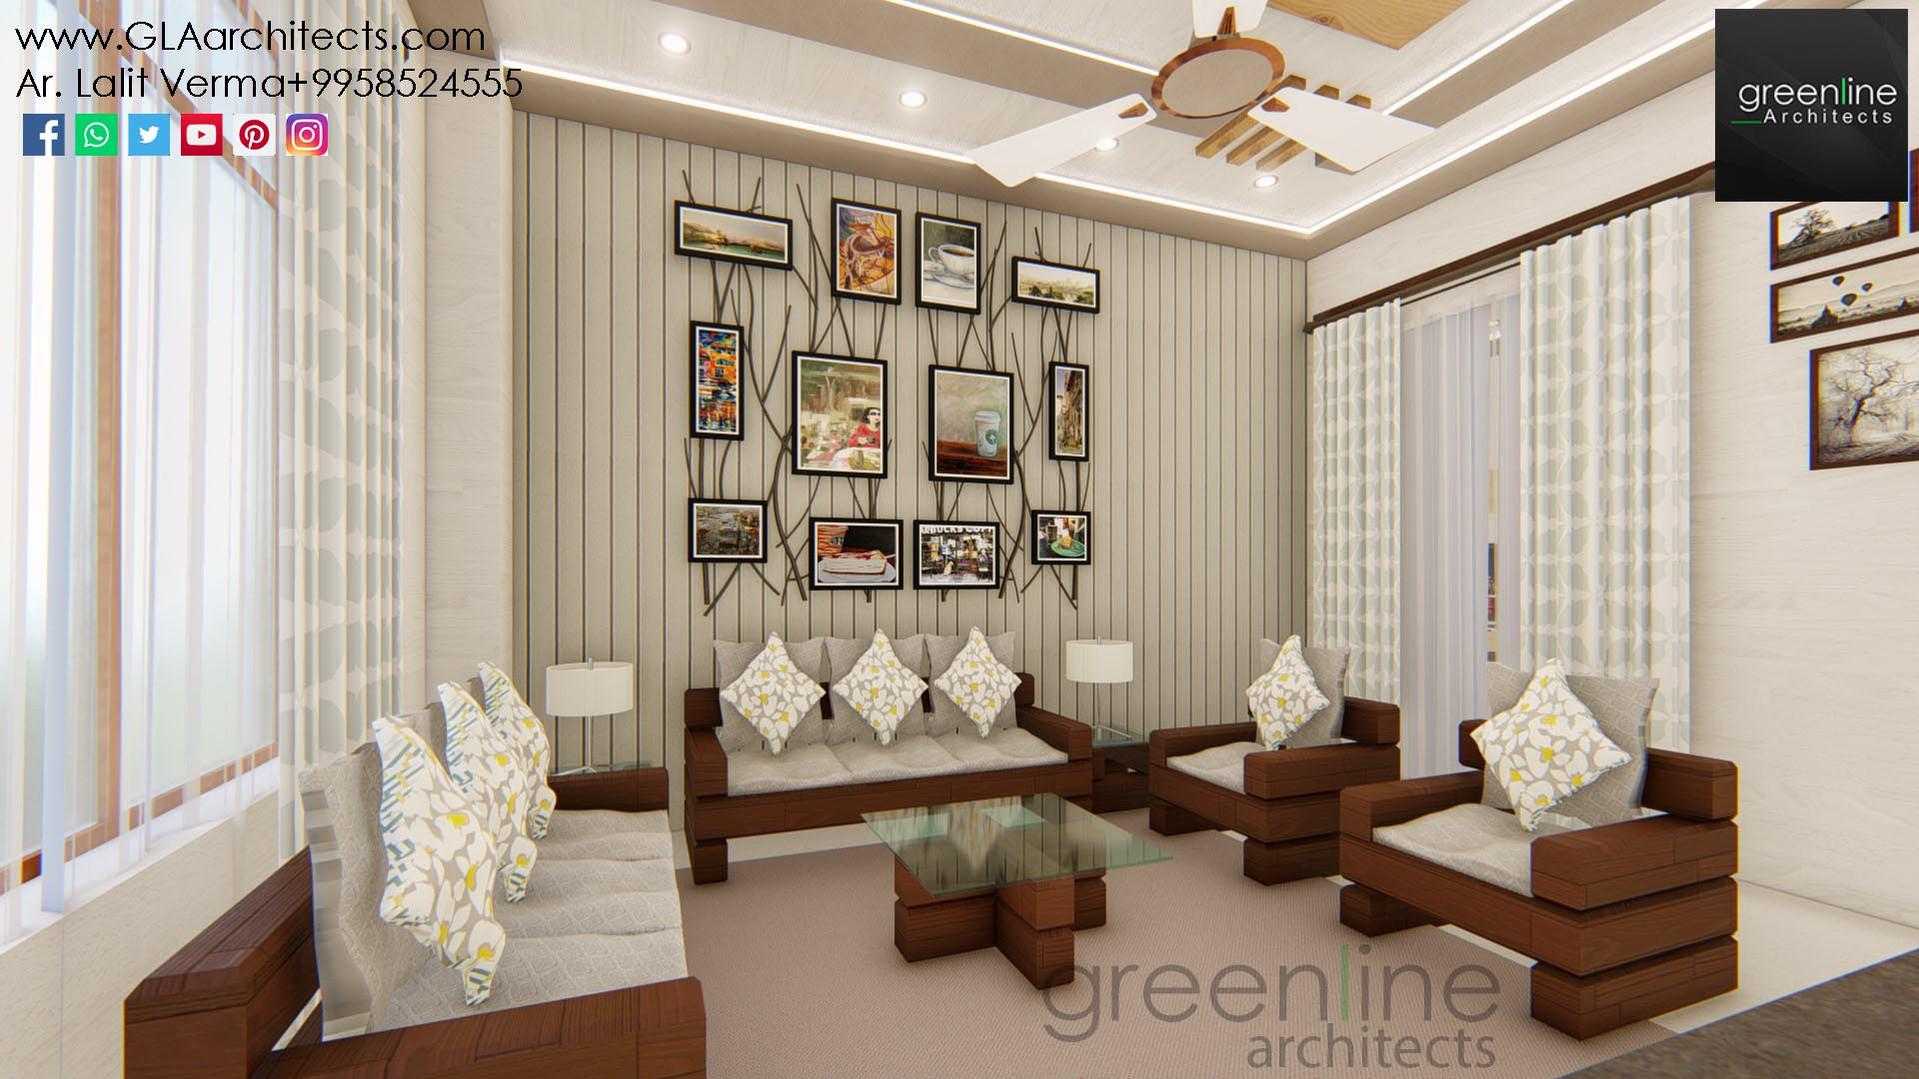 3 BHK-Apartment_Home Interior (2).jpg